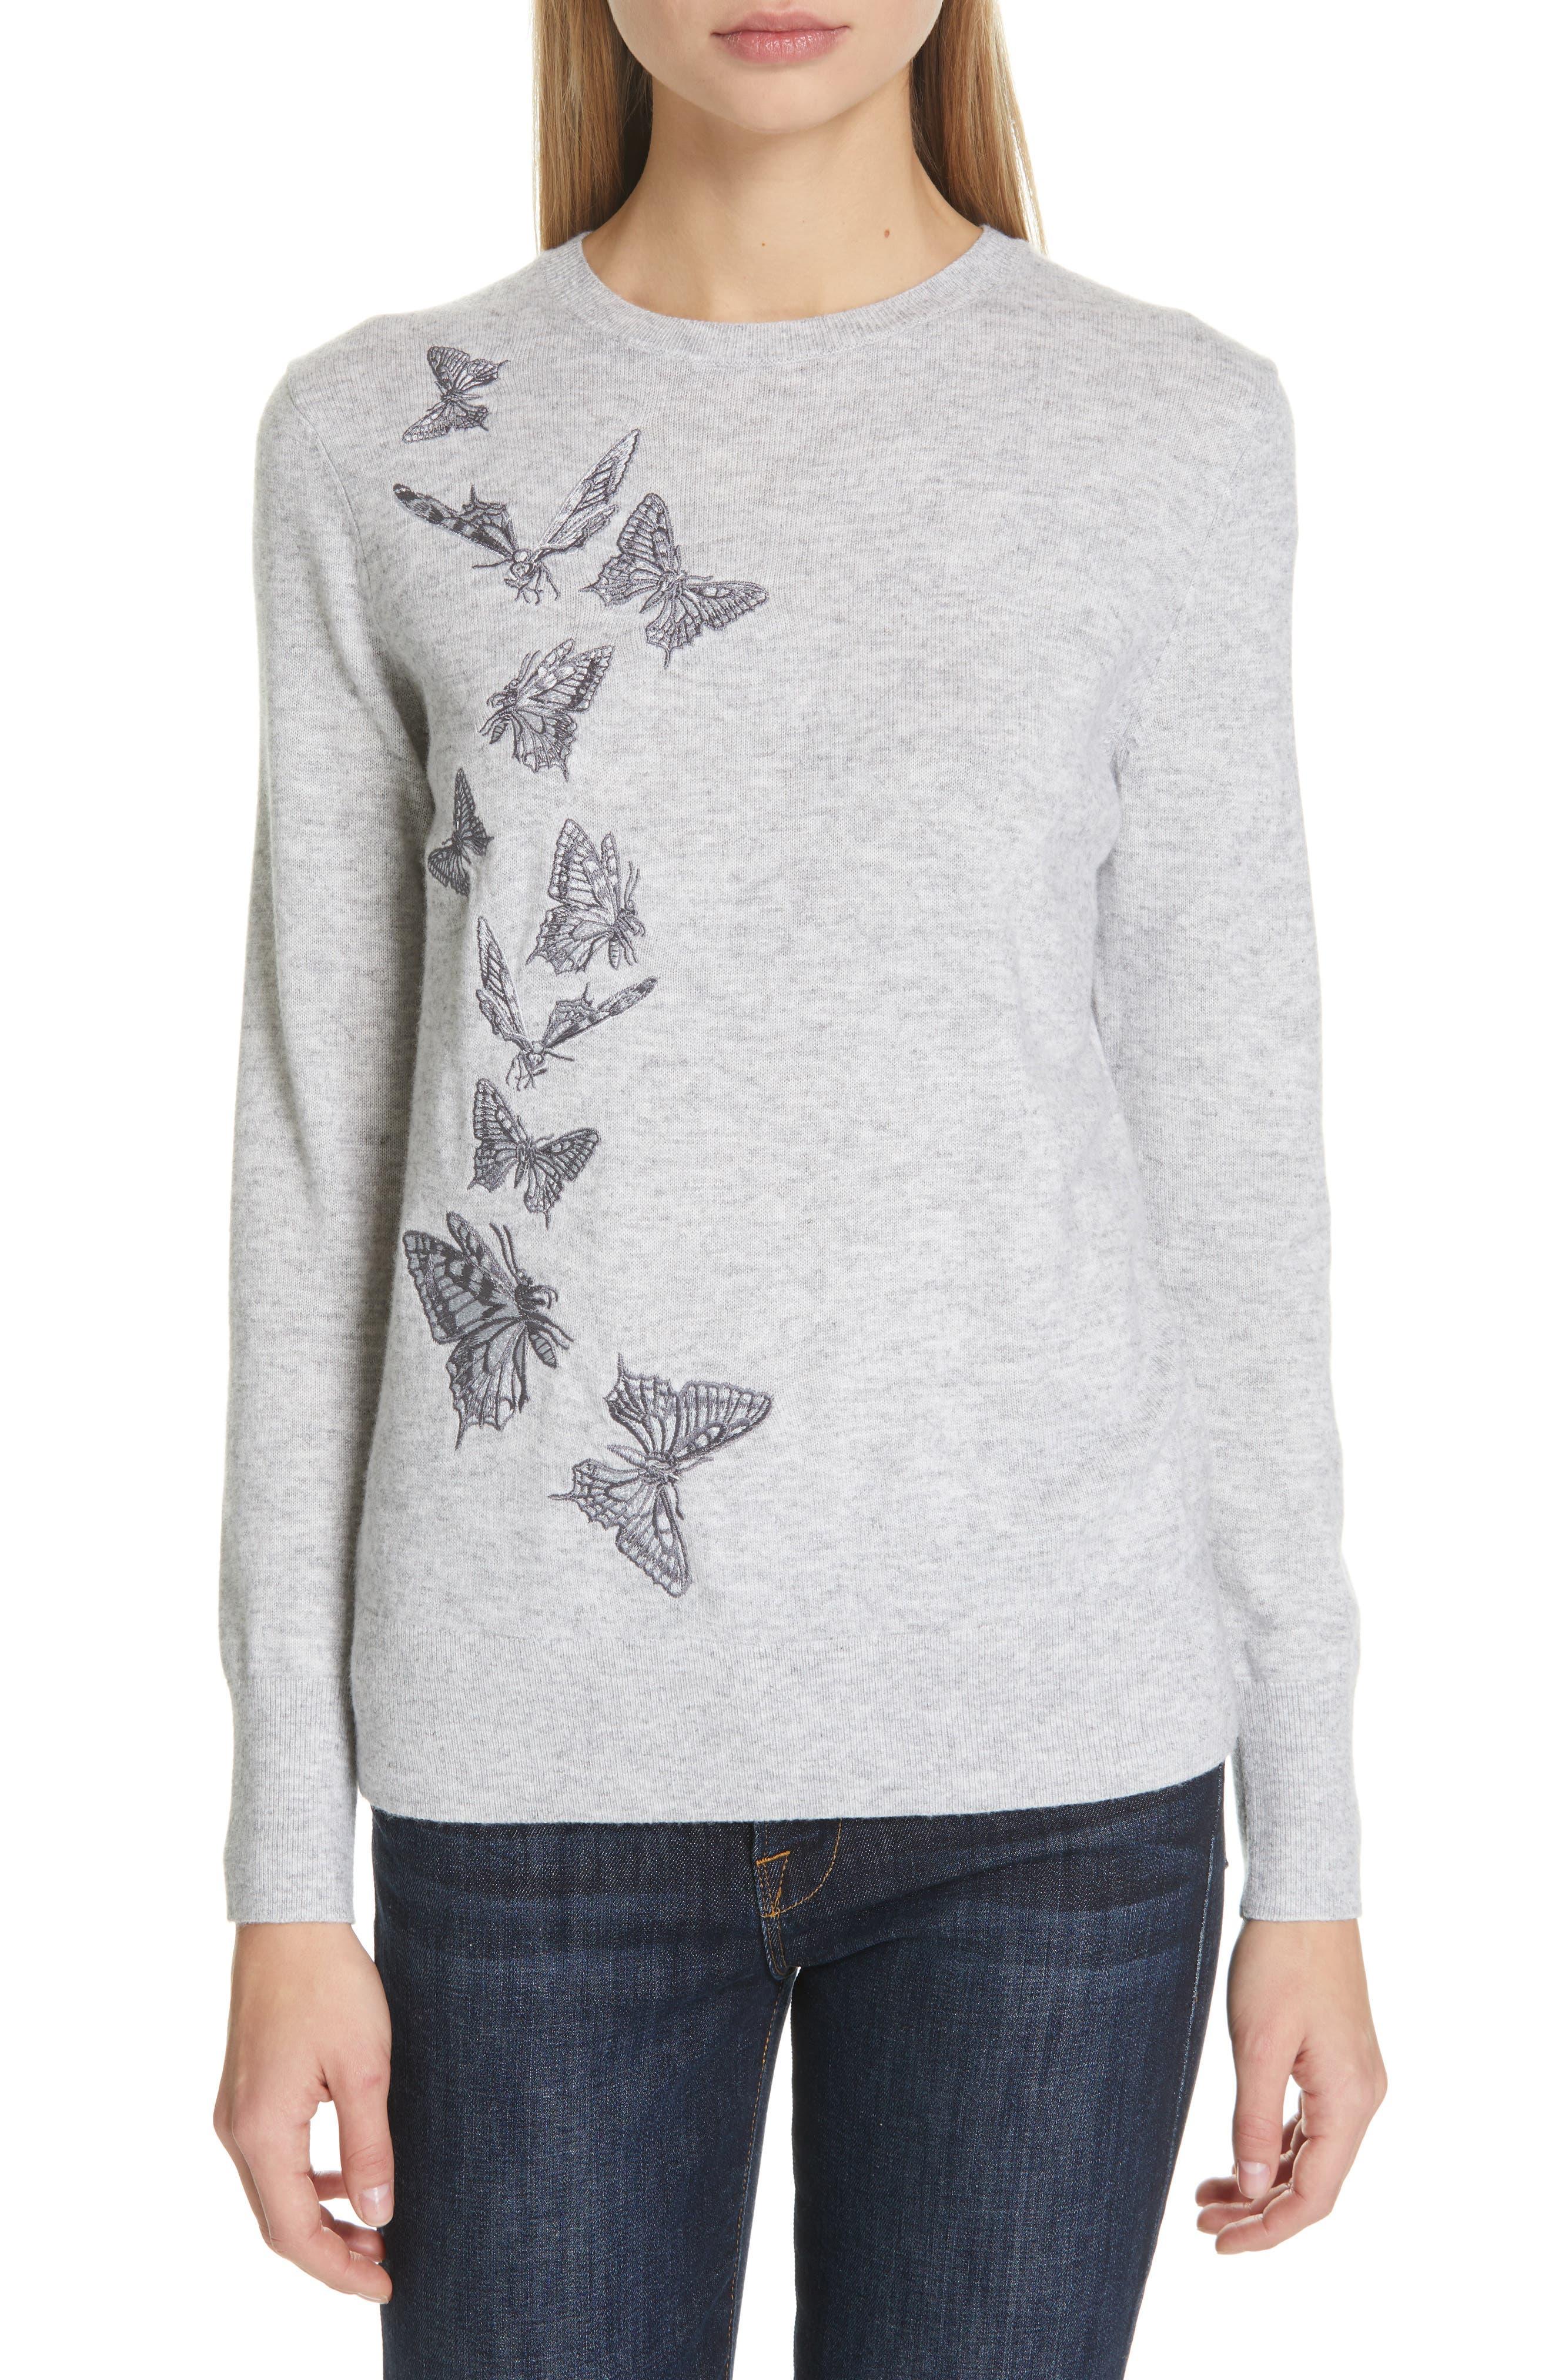 TED BAKER LONDON Redinn Butterfly Sweater, Main, color, GREY